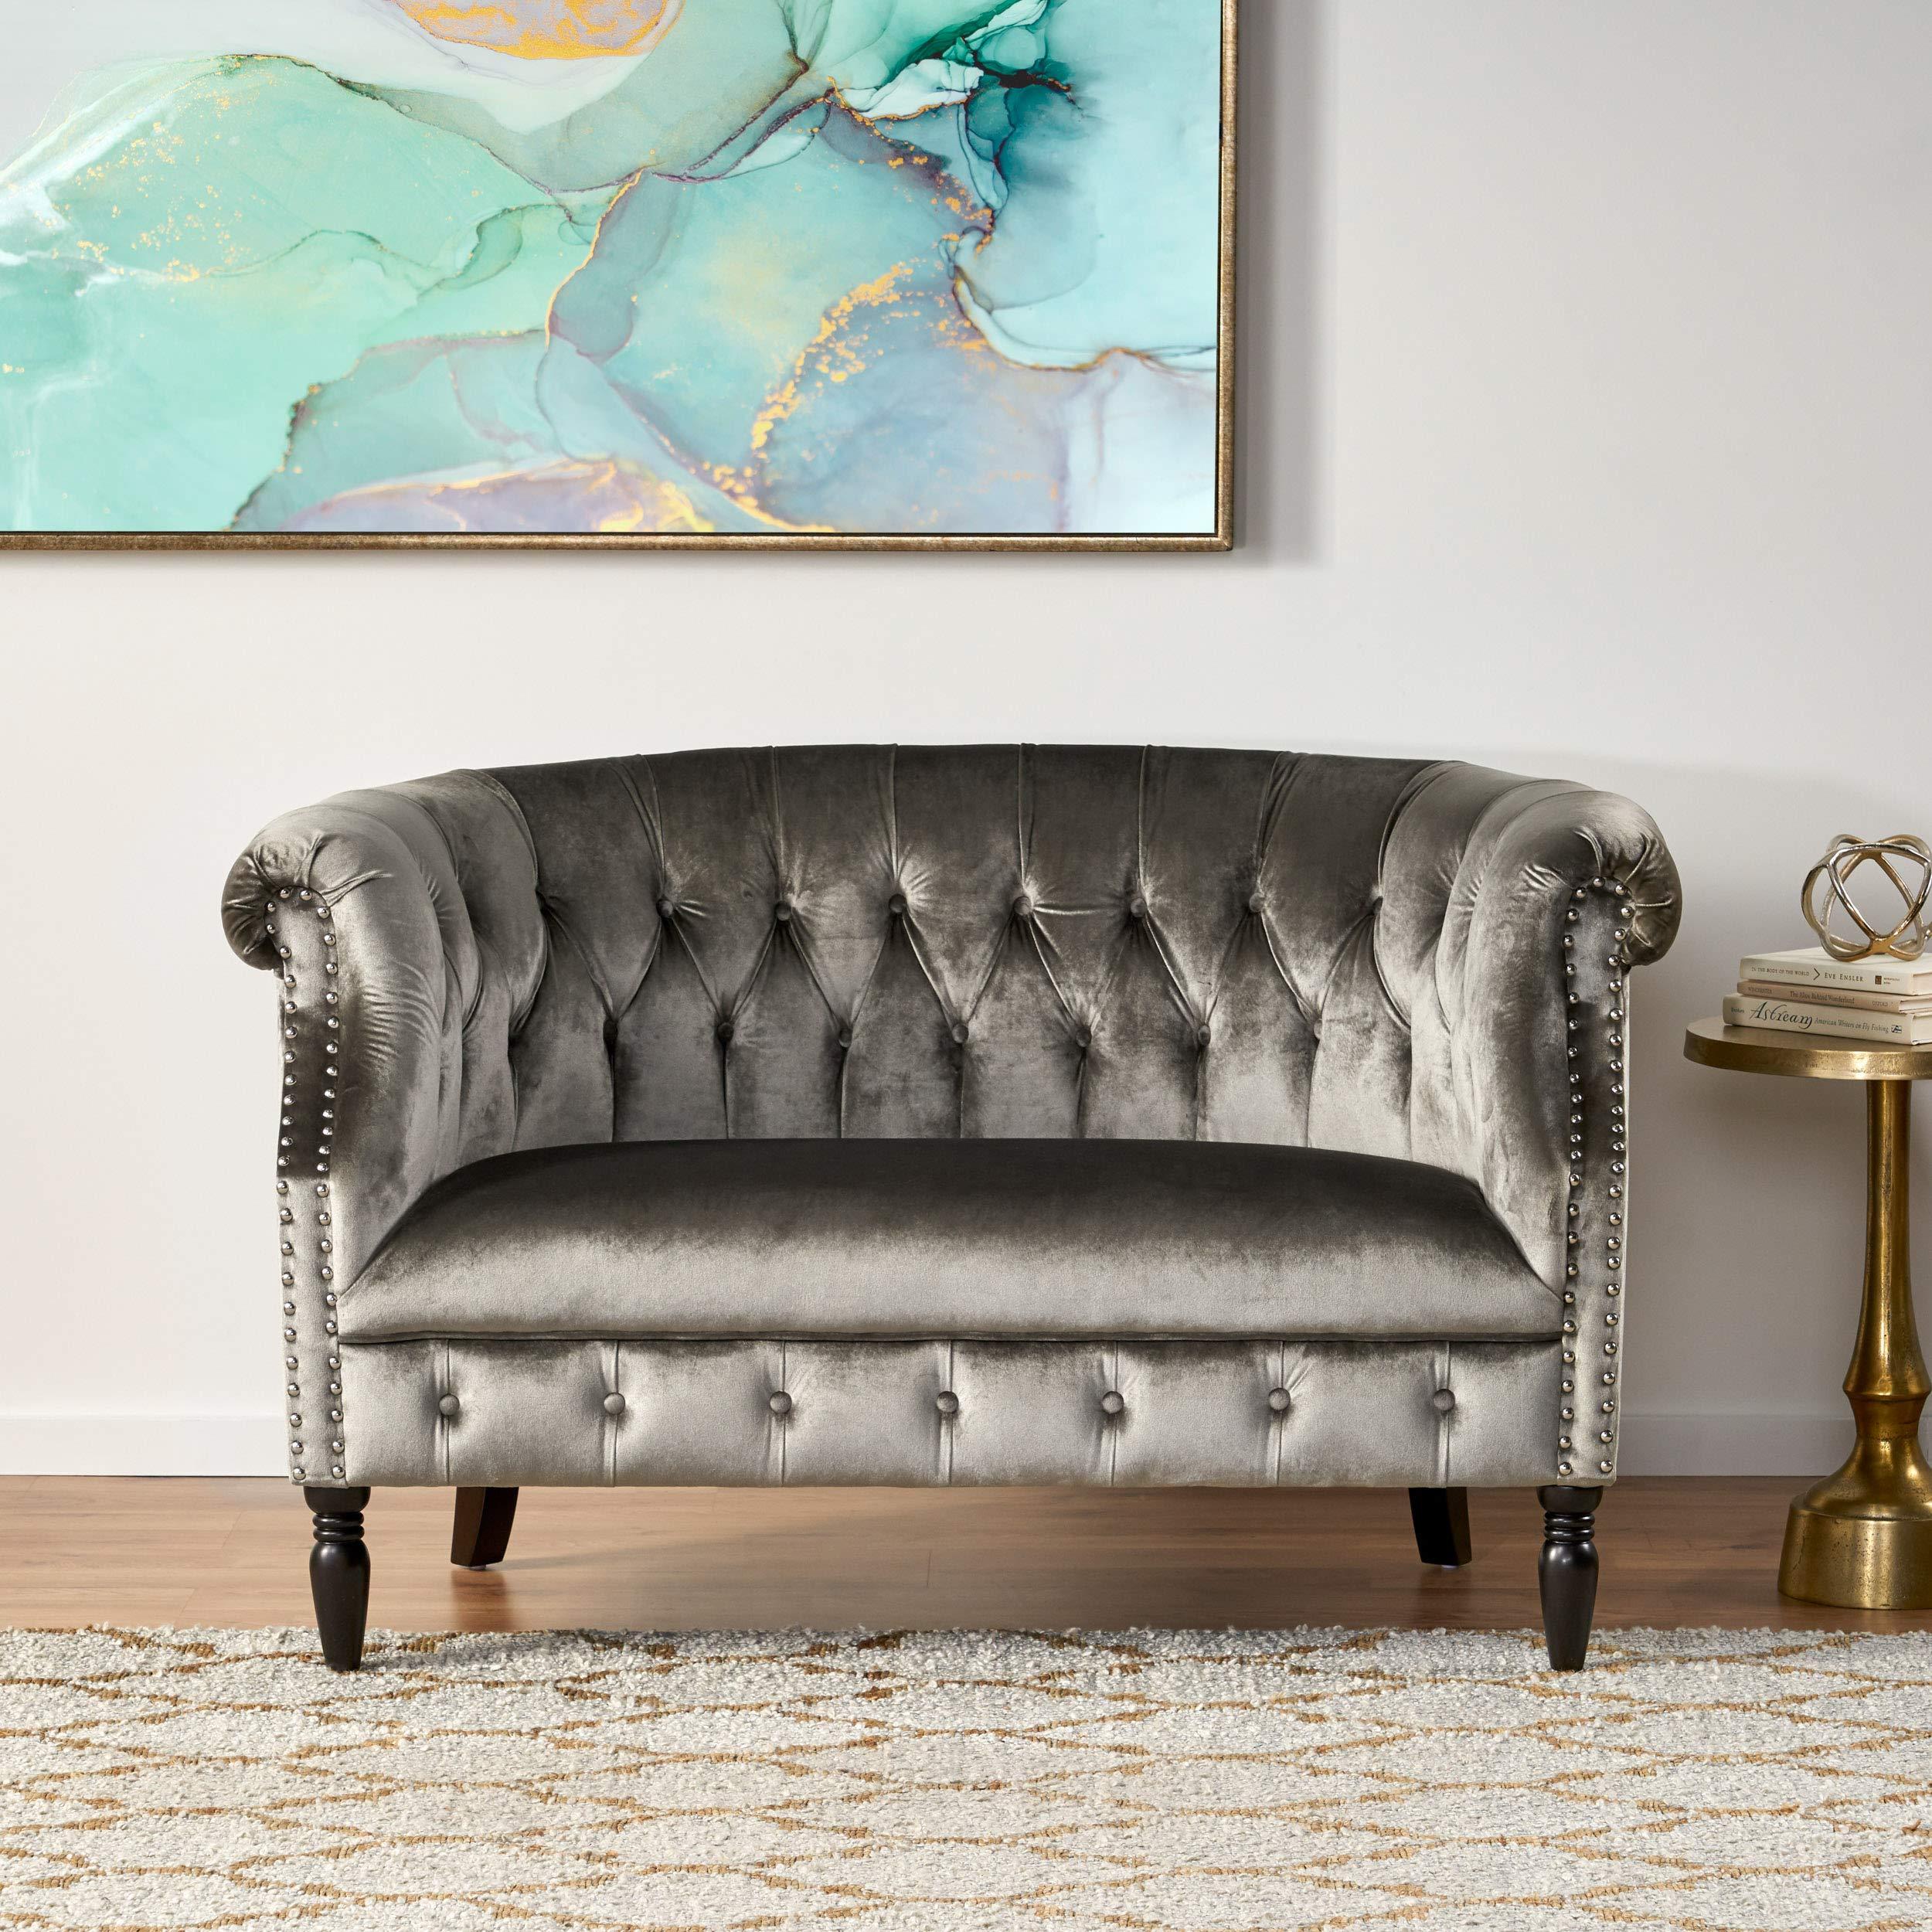 Christopher Knight Home Milani Tufted Scroll Arm Velvet Loveseat Grey Dark Brown Furniture Decor